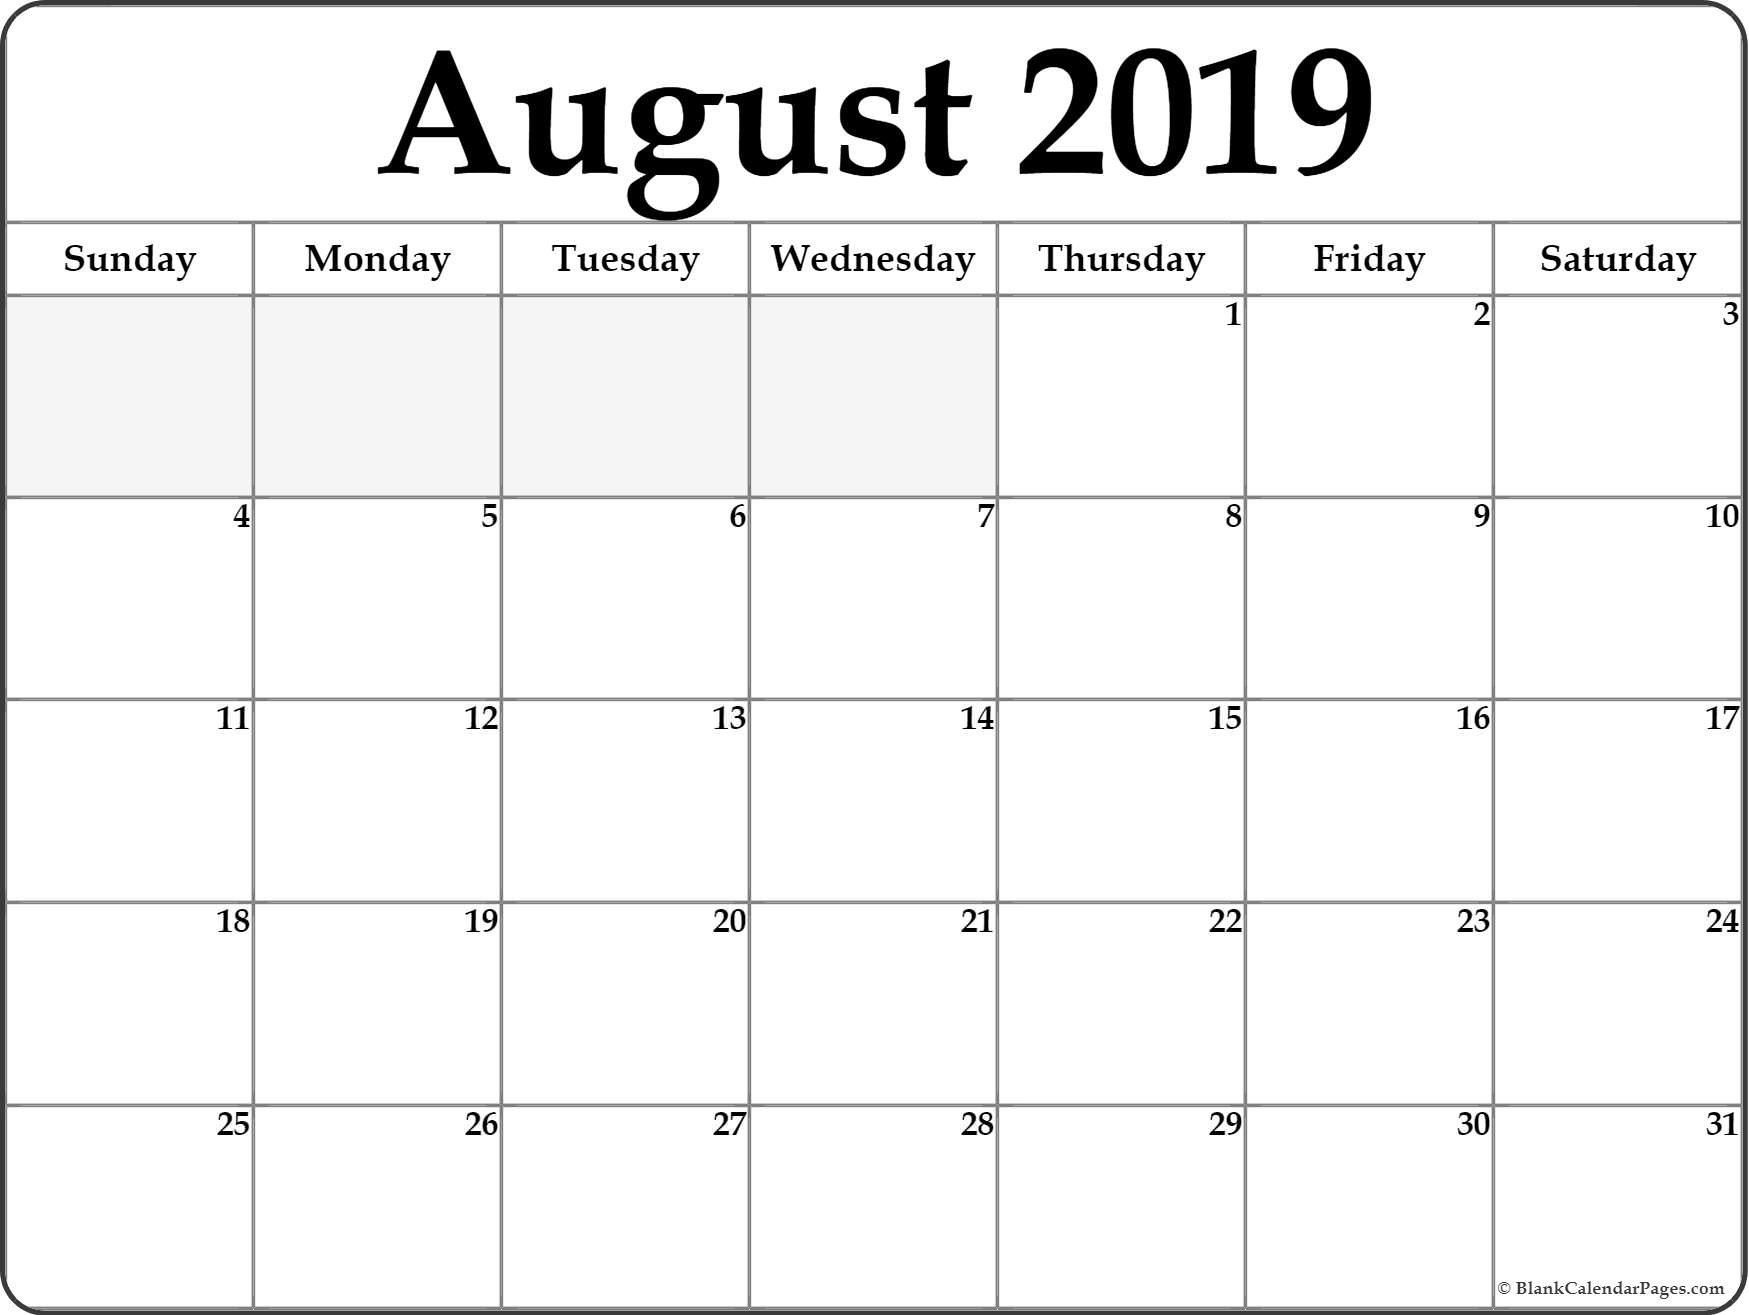 August 2019 Calendar   Free Printable Monthly Calendars regarding Pretty Blank Augst Calender